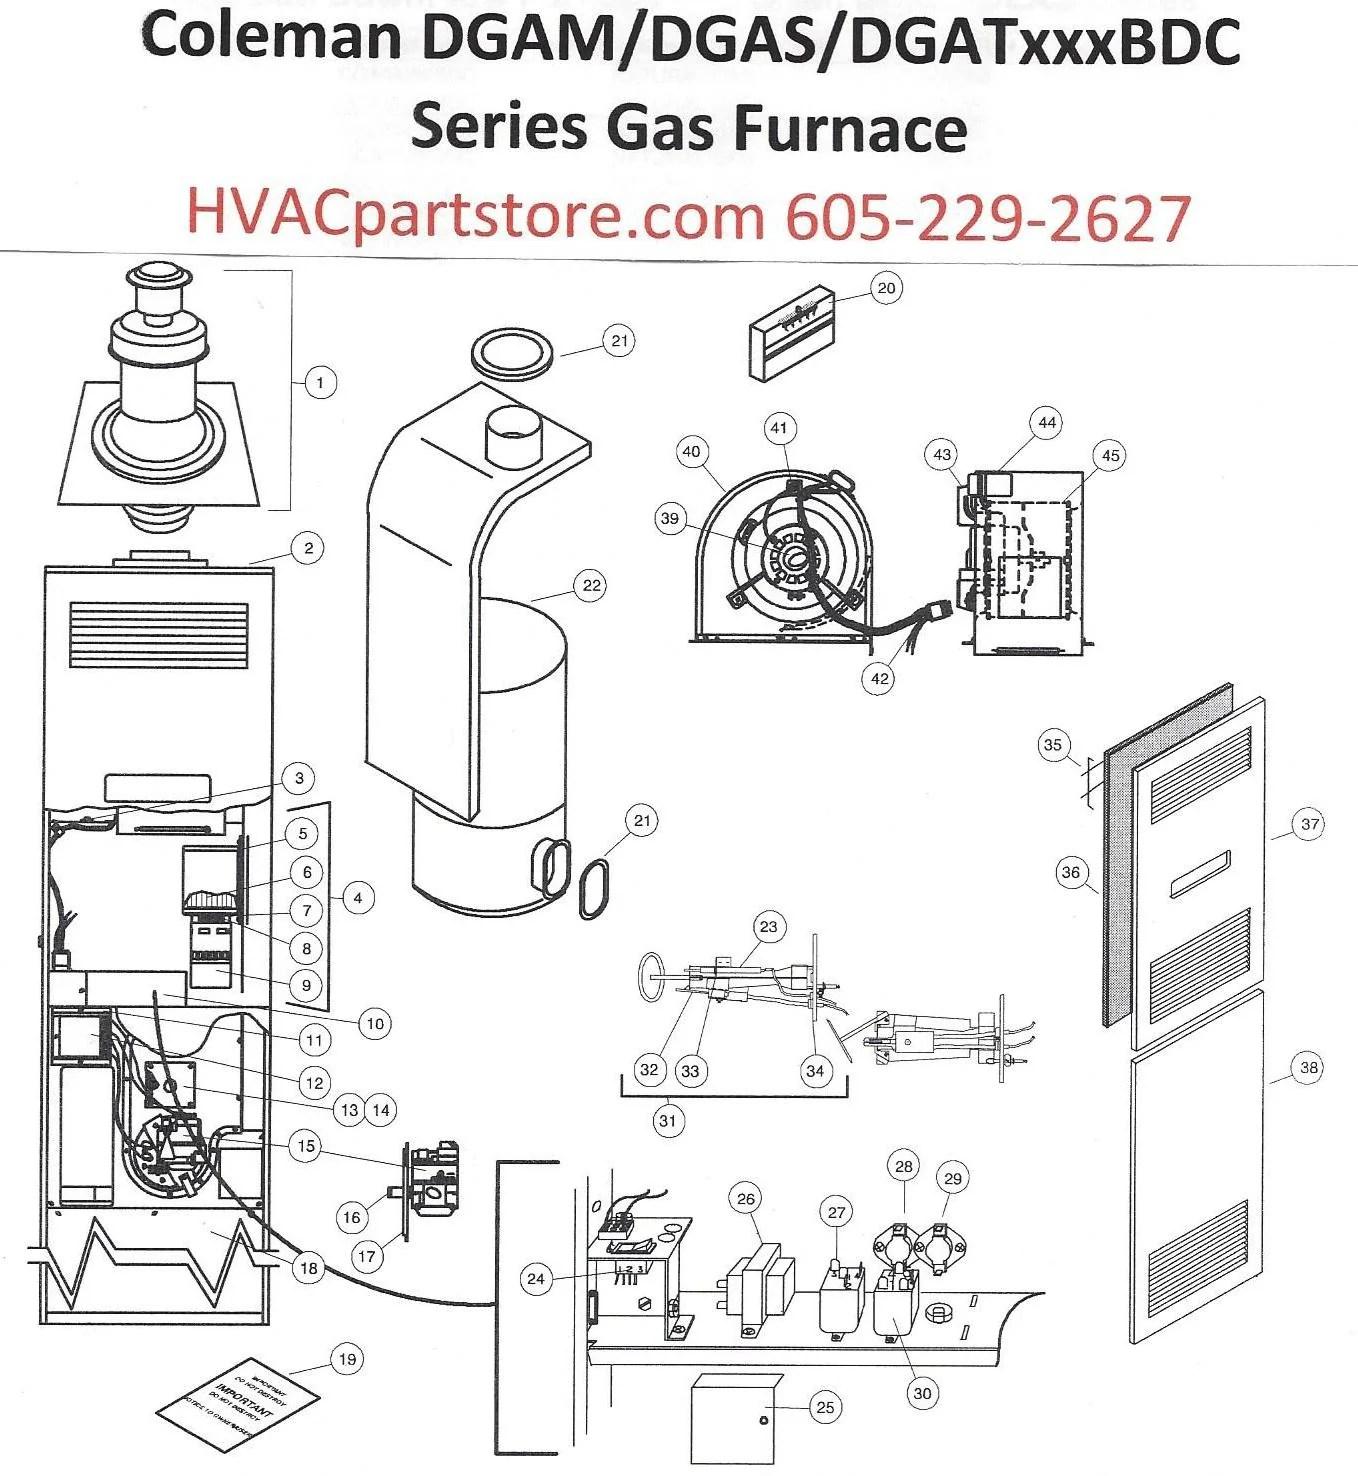 DGAM056BDD Coleman Gas Furnace Parts – HVACpartstore